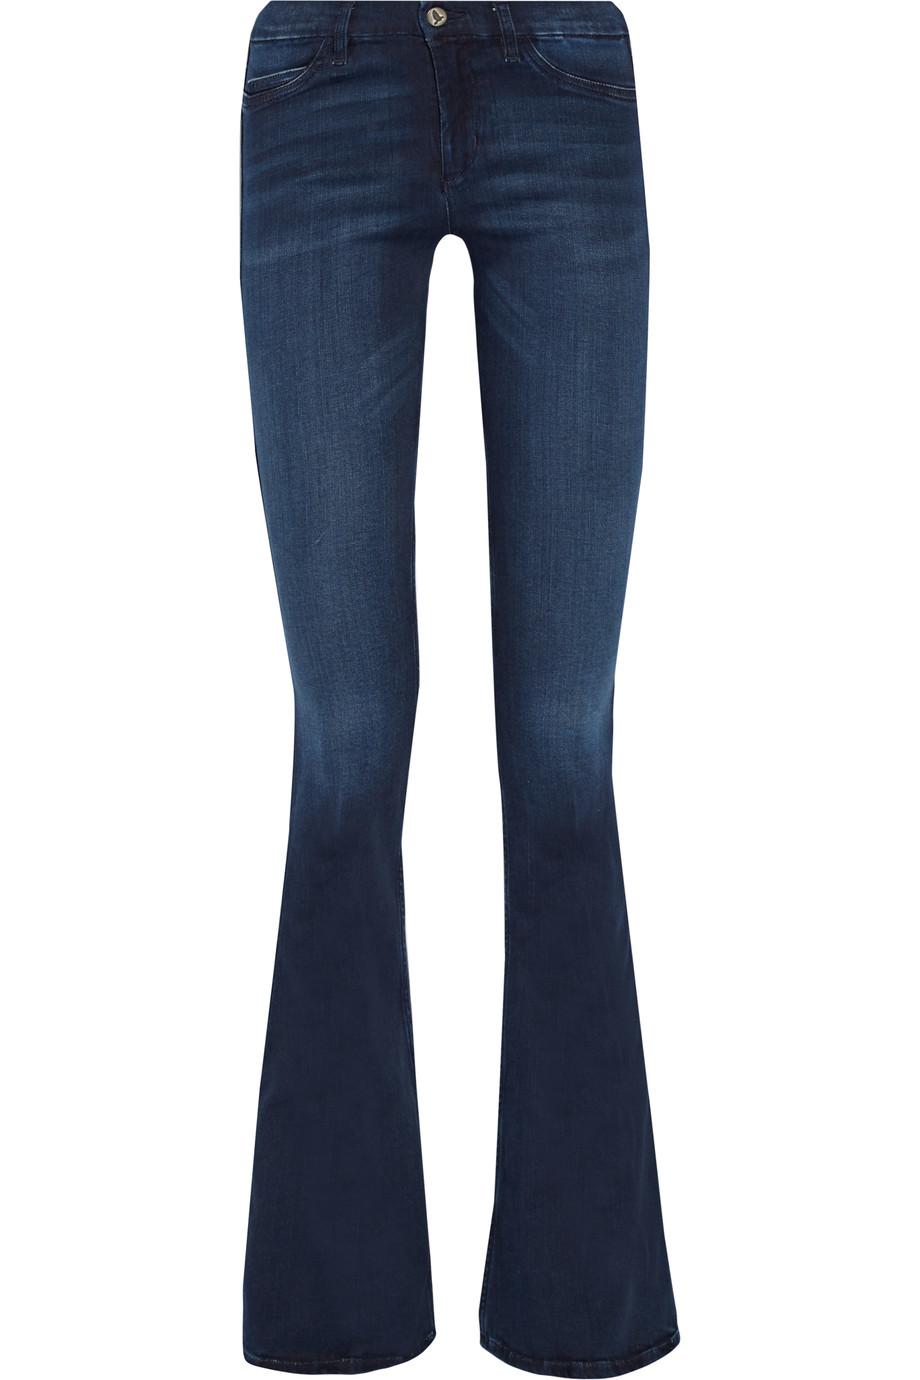 MIH-Jeans-Skinny-Marrakesh.jpg